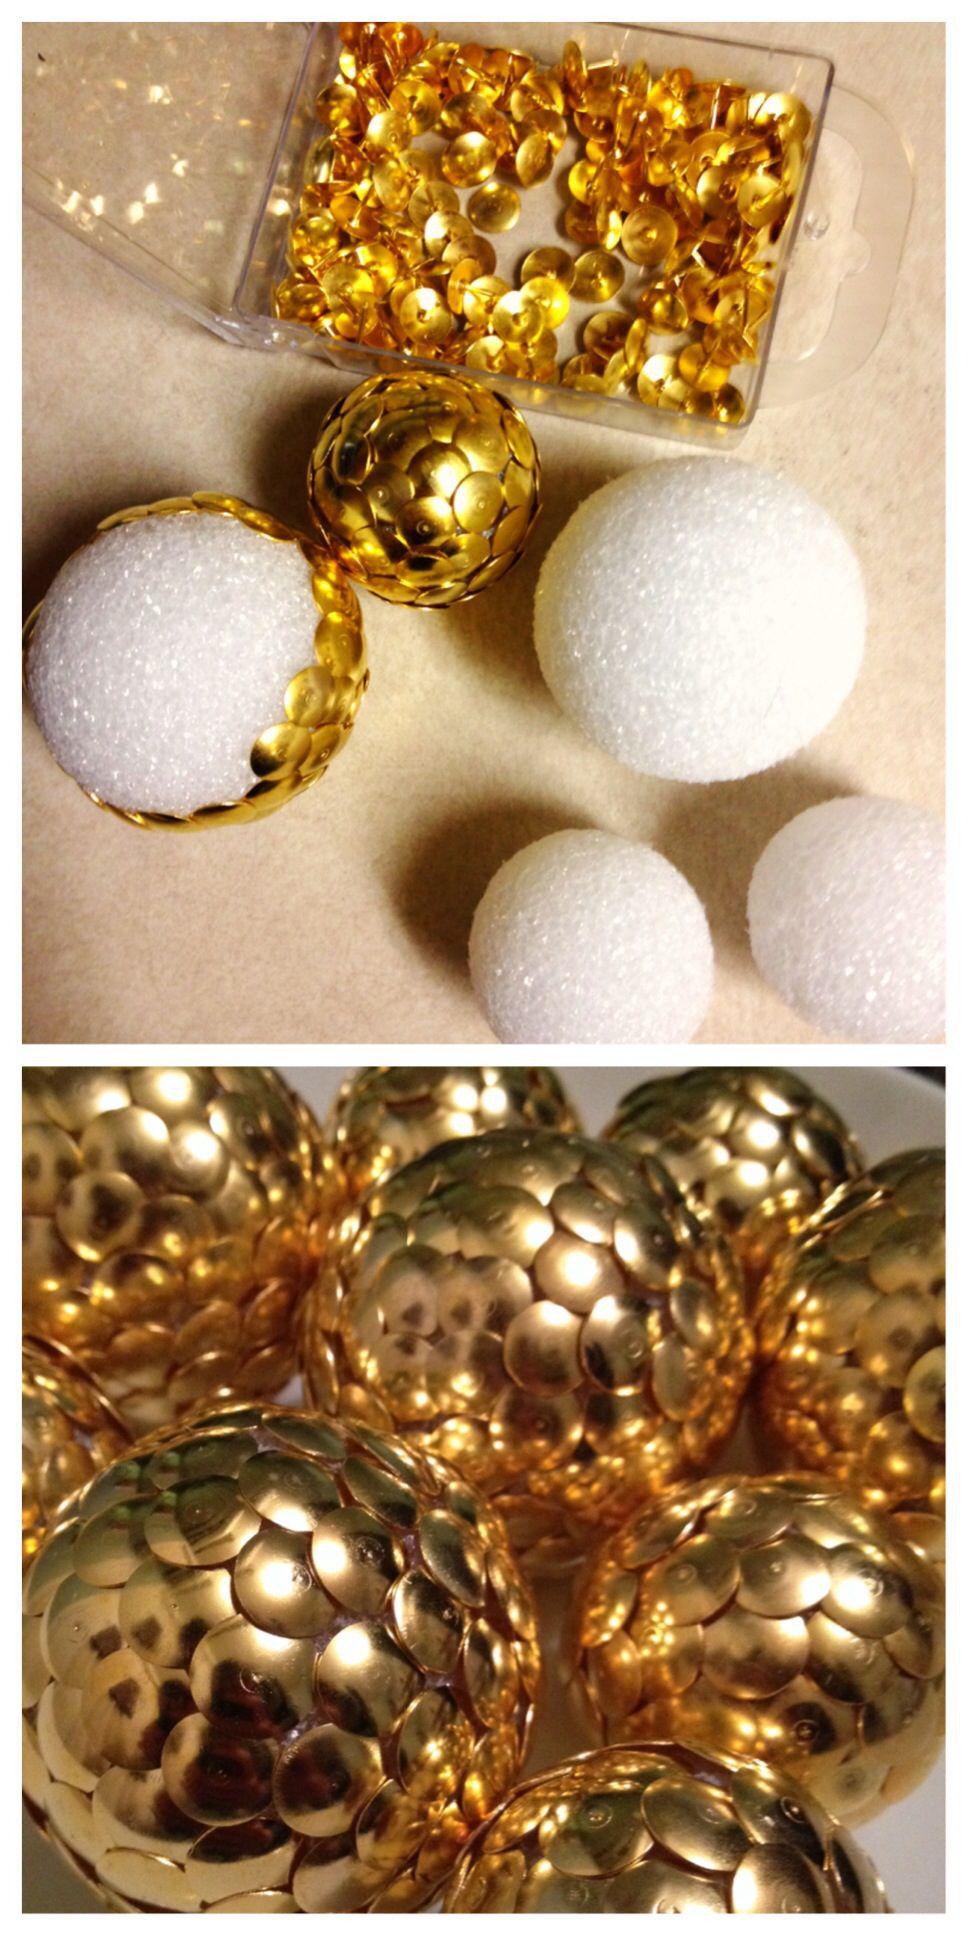 Spanish moss for crafts - Dollar Store Gold Thumbtacks Styrofoam Balls Awesomeness